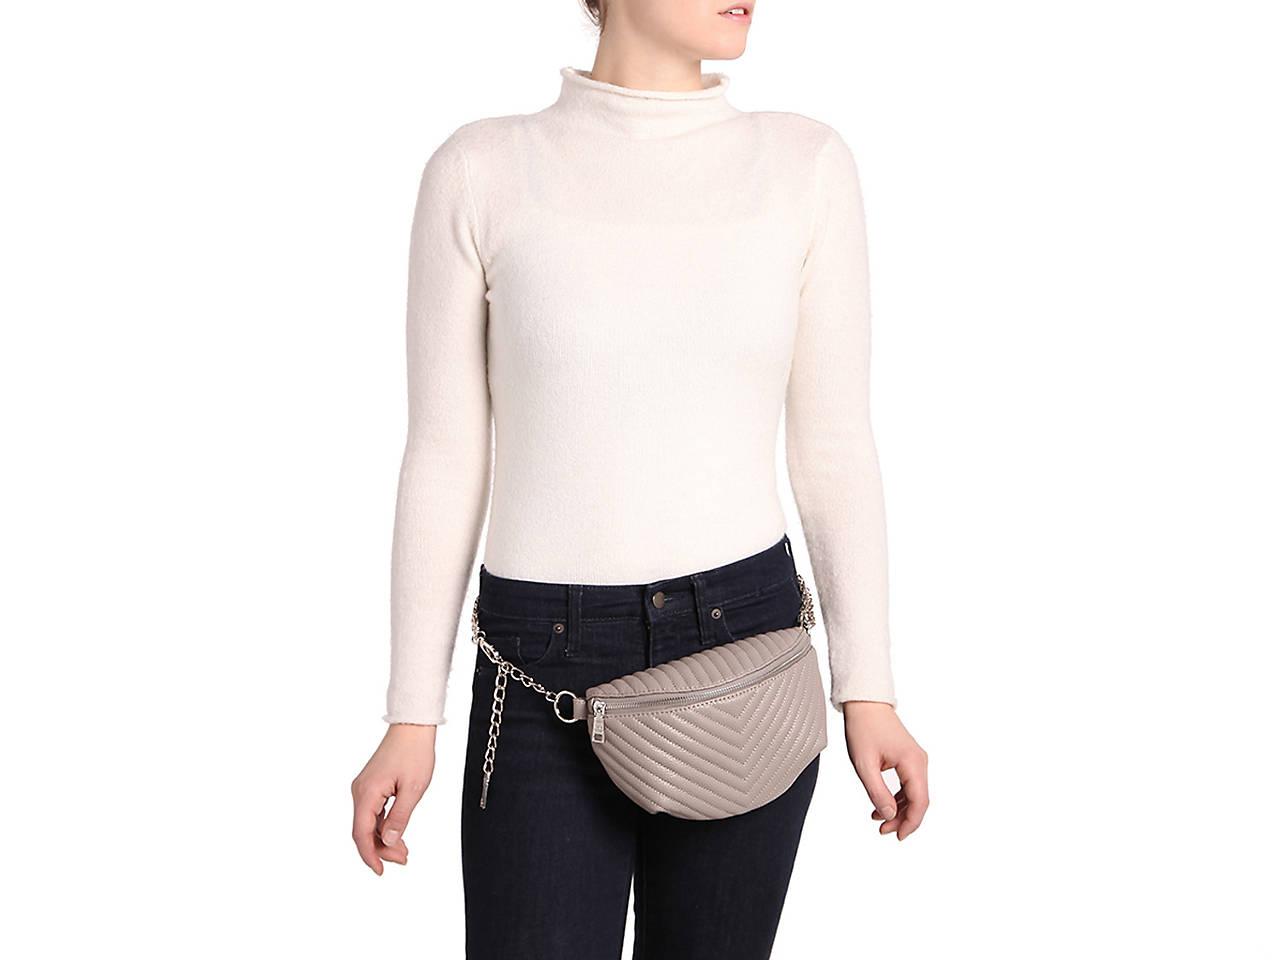 be4df834d378 Steve Madden Bfanny Belt Bag Women's Handbags & Accessories   DSW